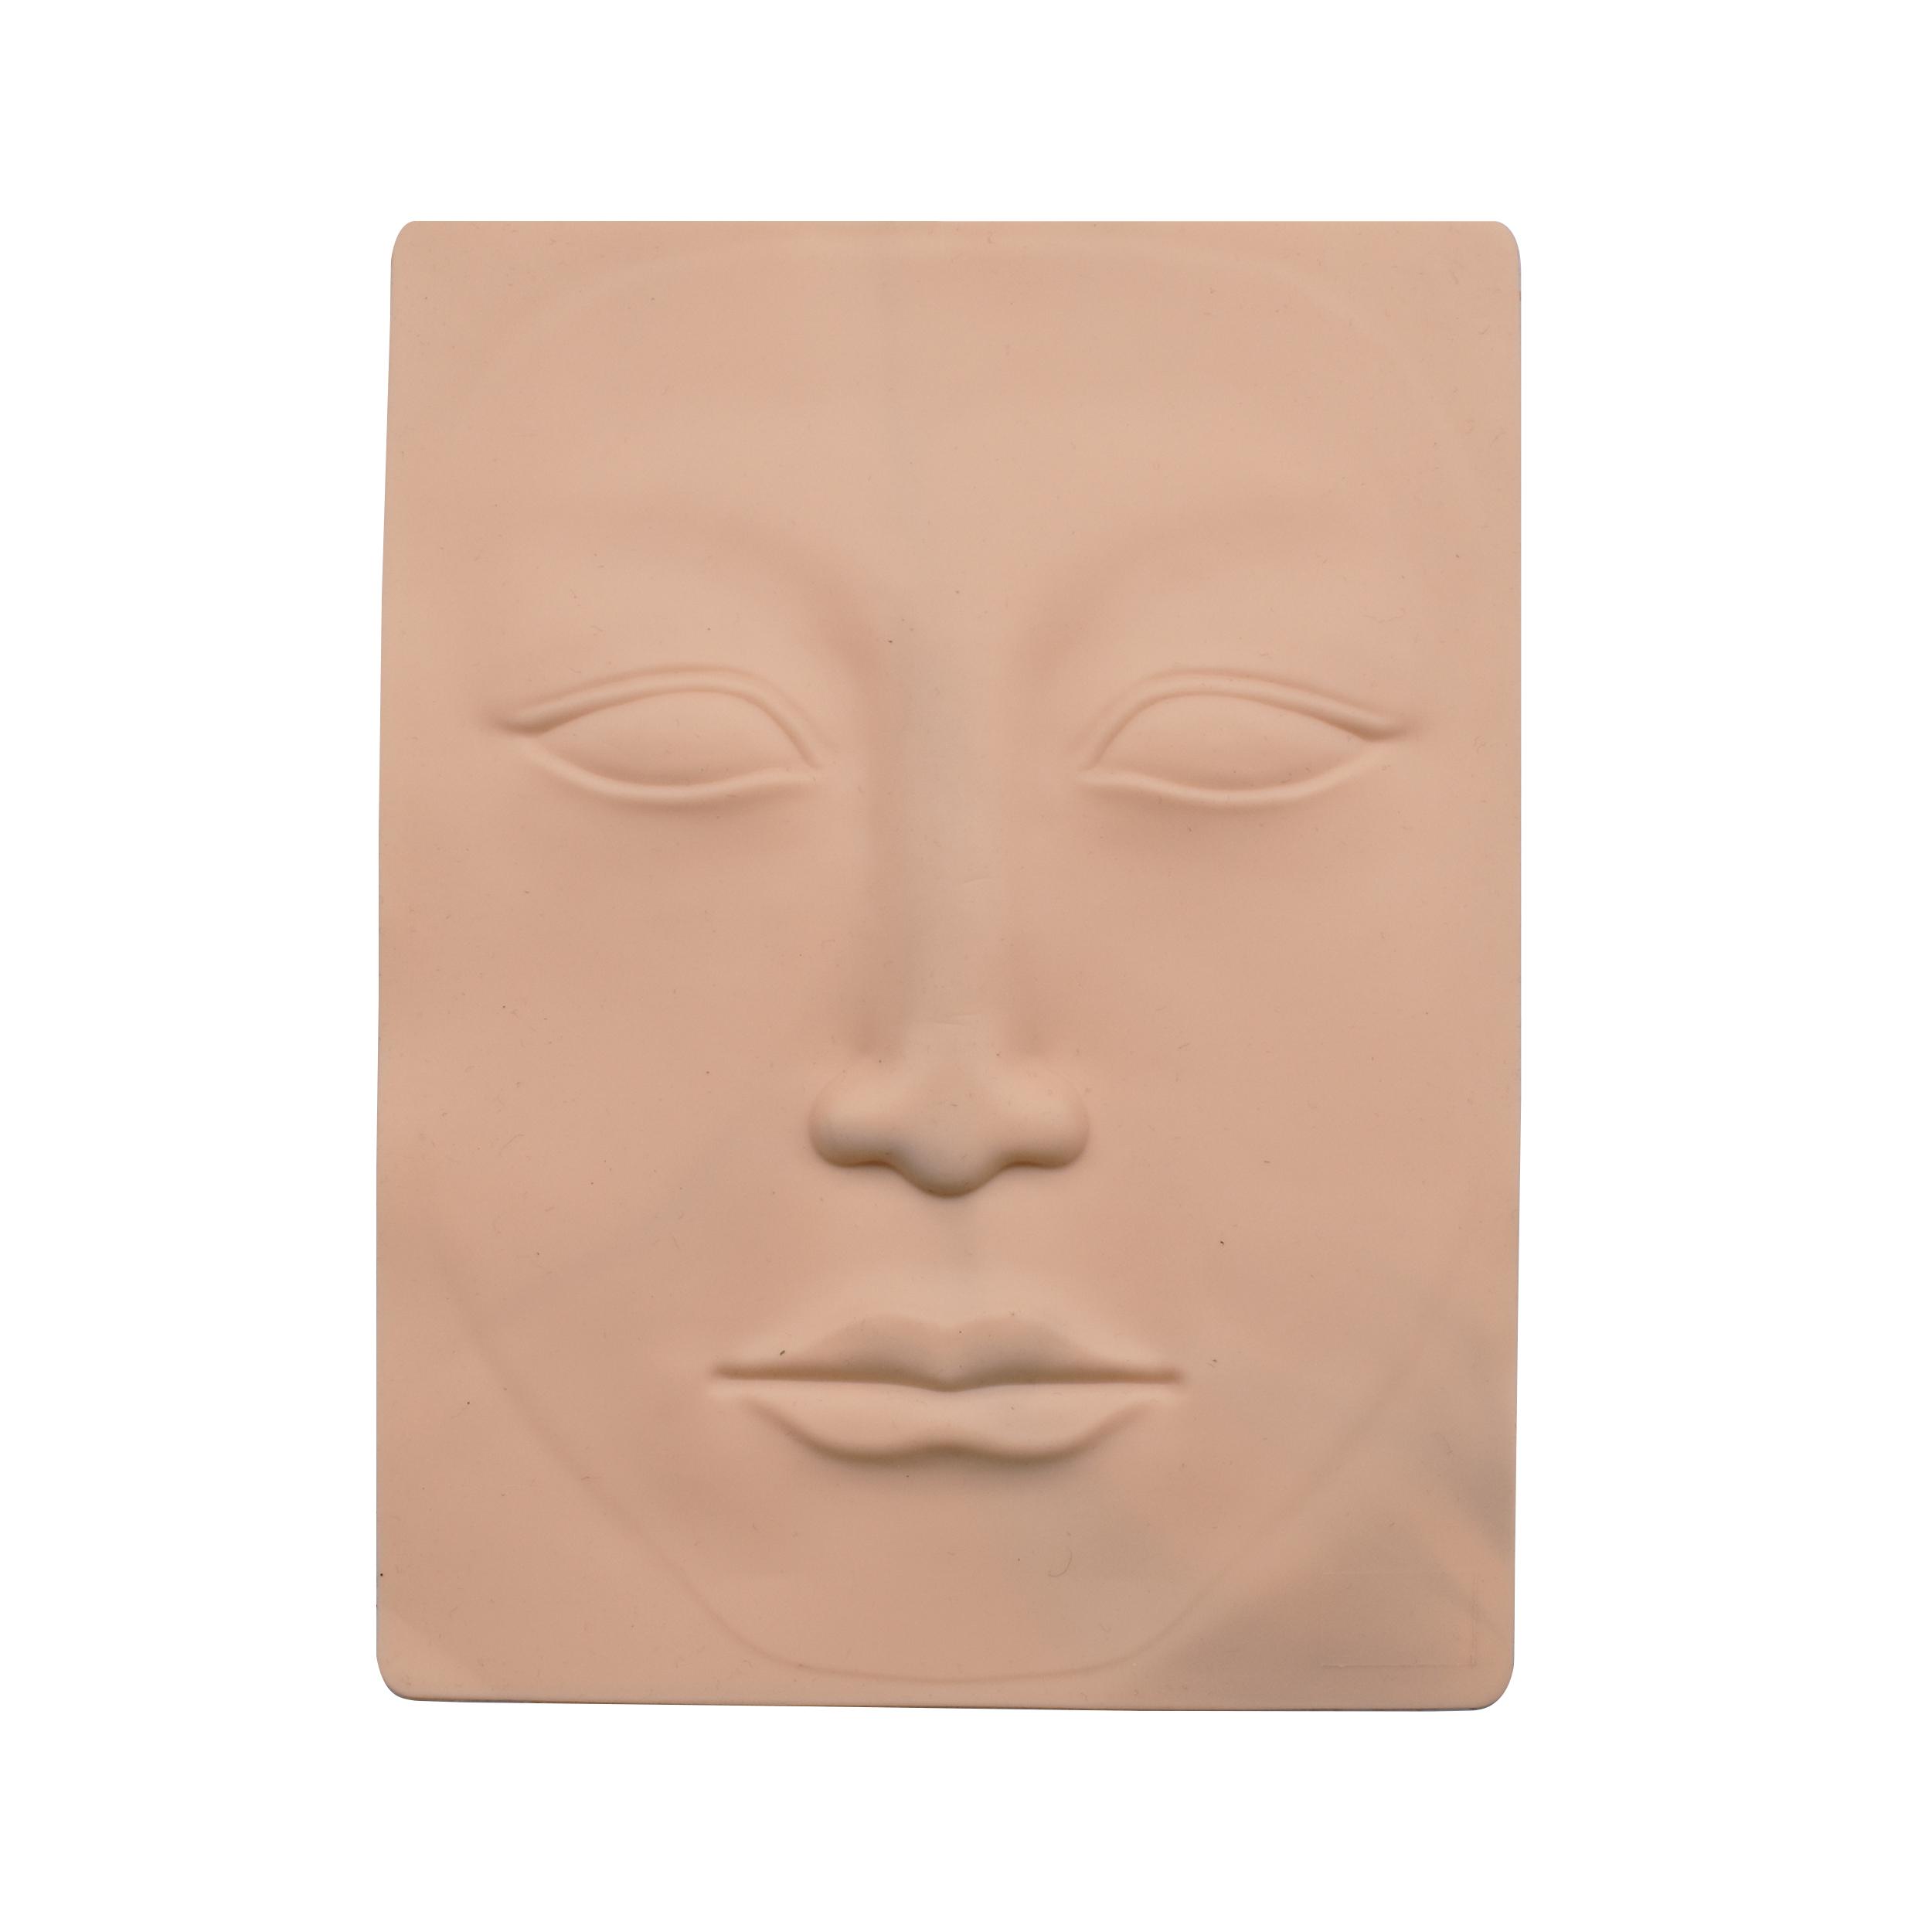 پوست مصنوعی تتو مدل Face-20